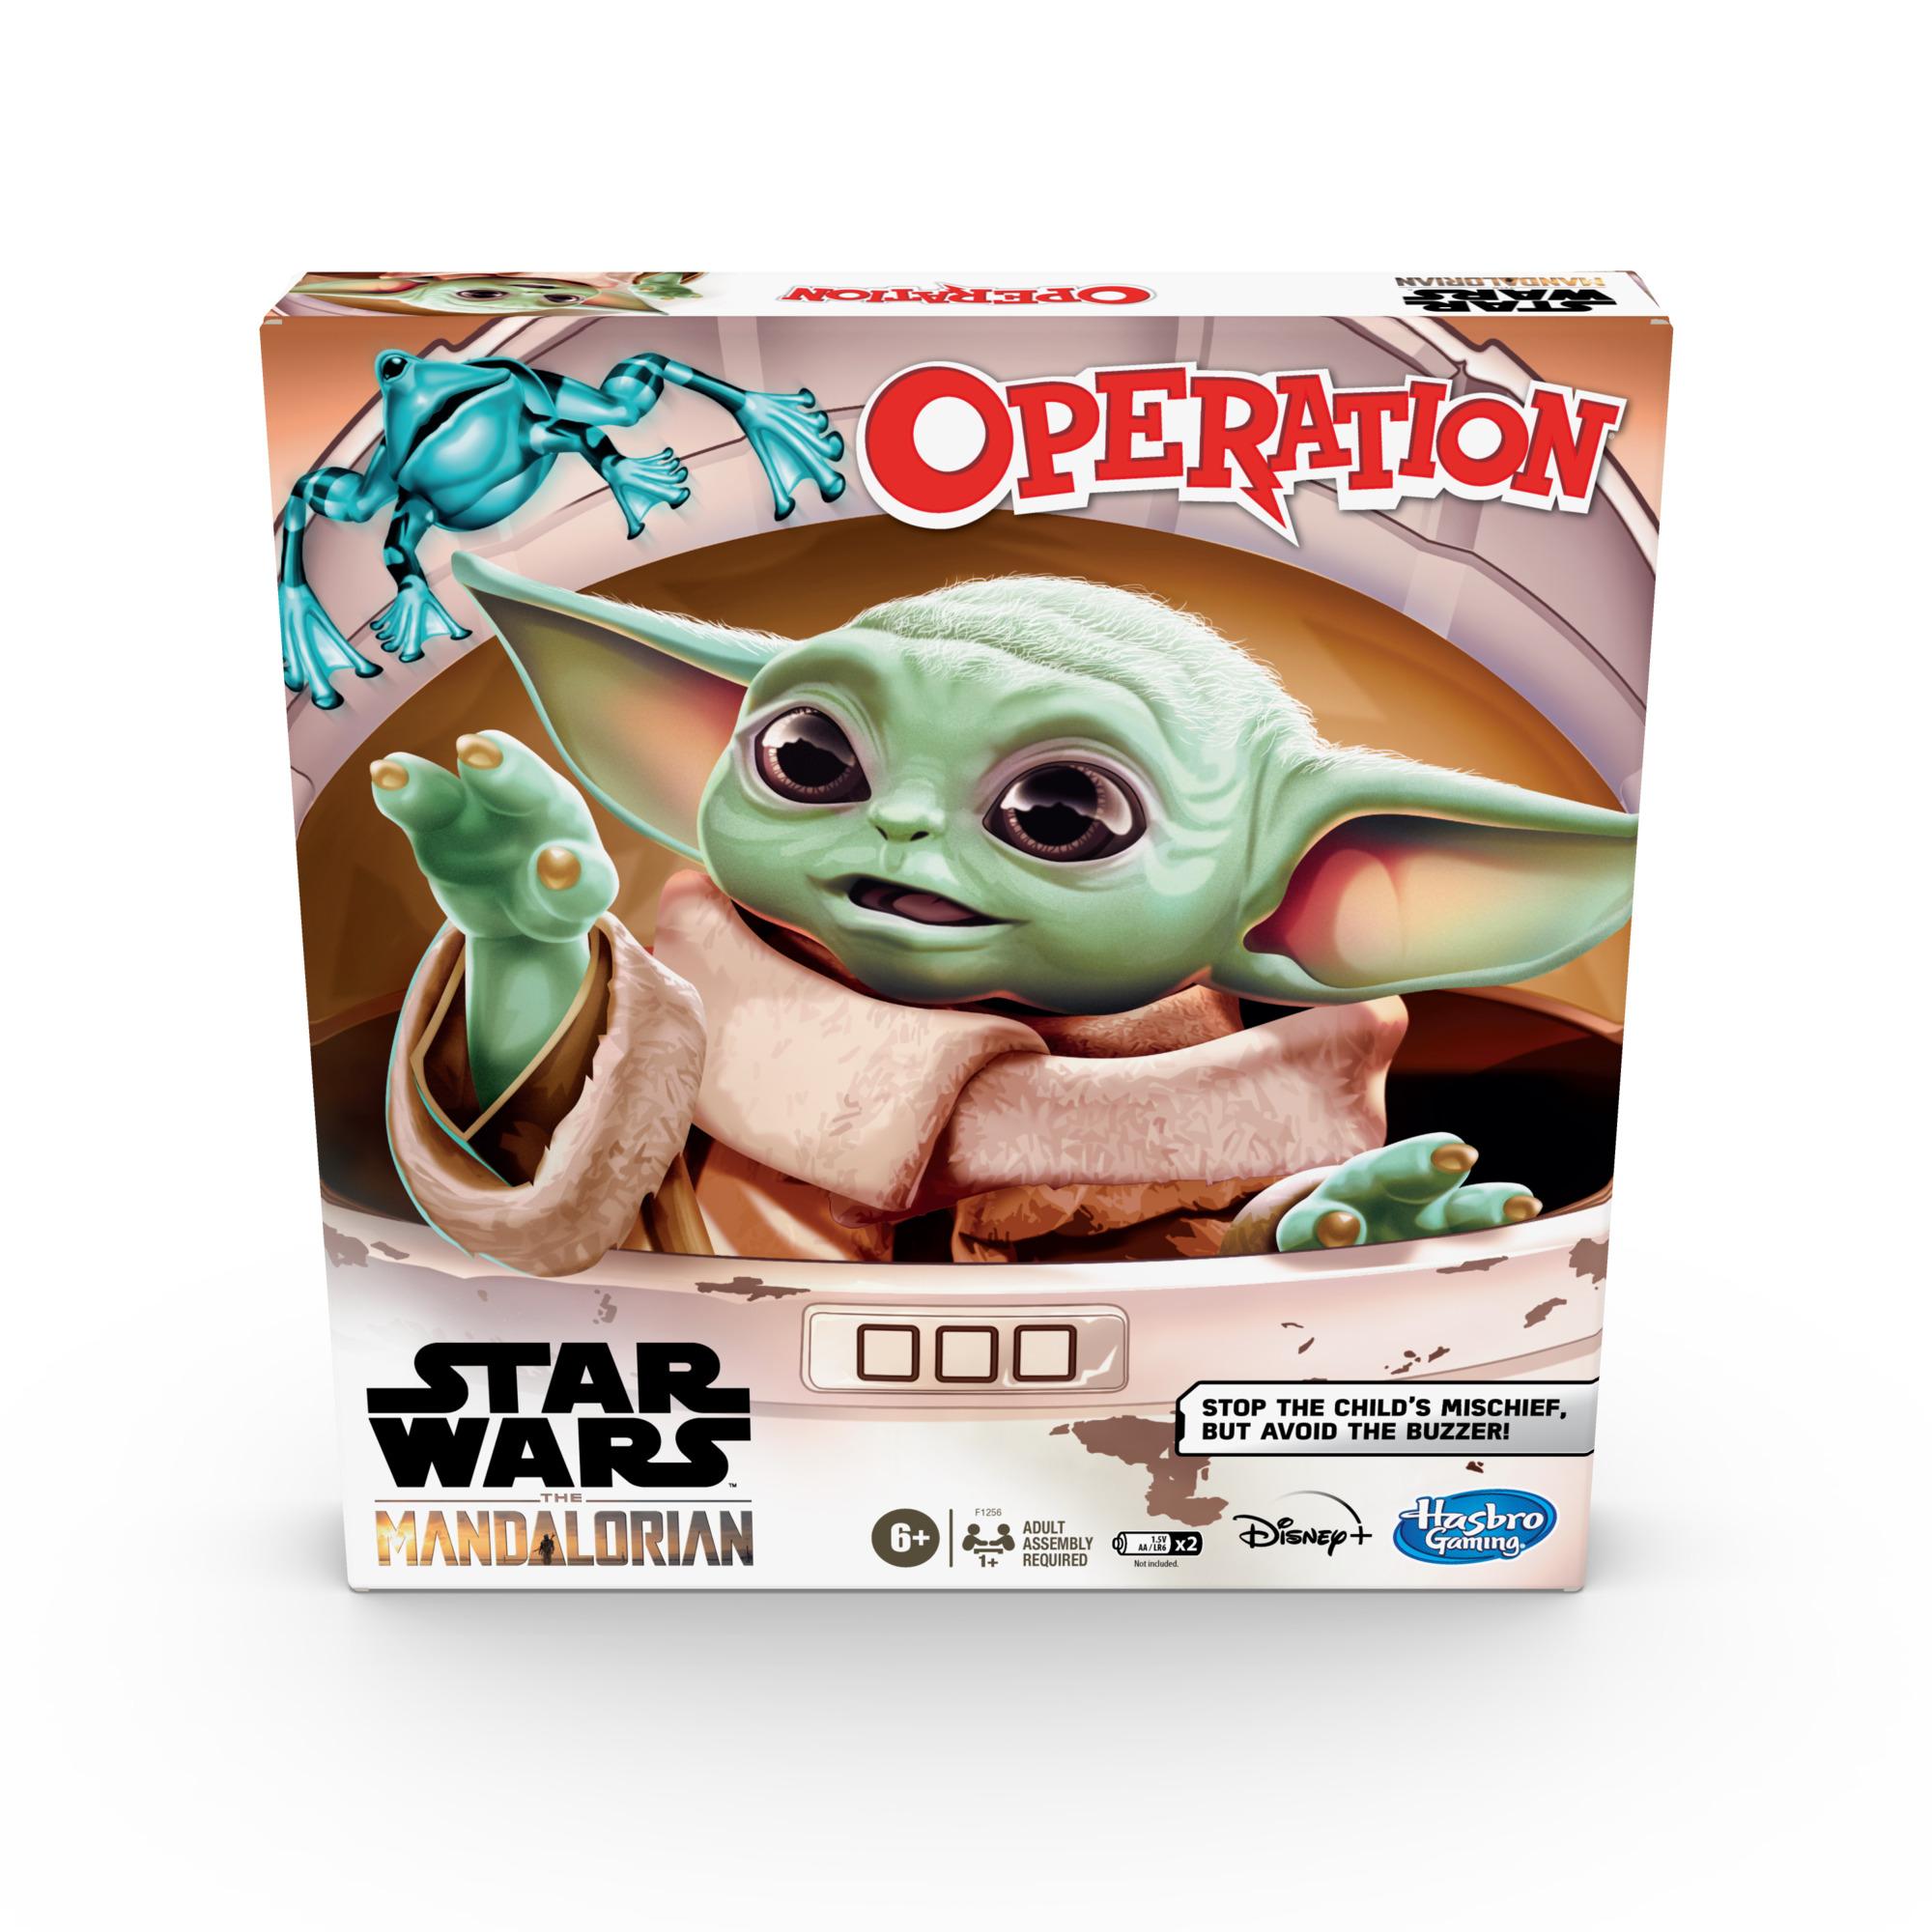 F12560000 Star Wars The Mandalorian Operation Game pkg